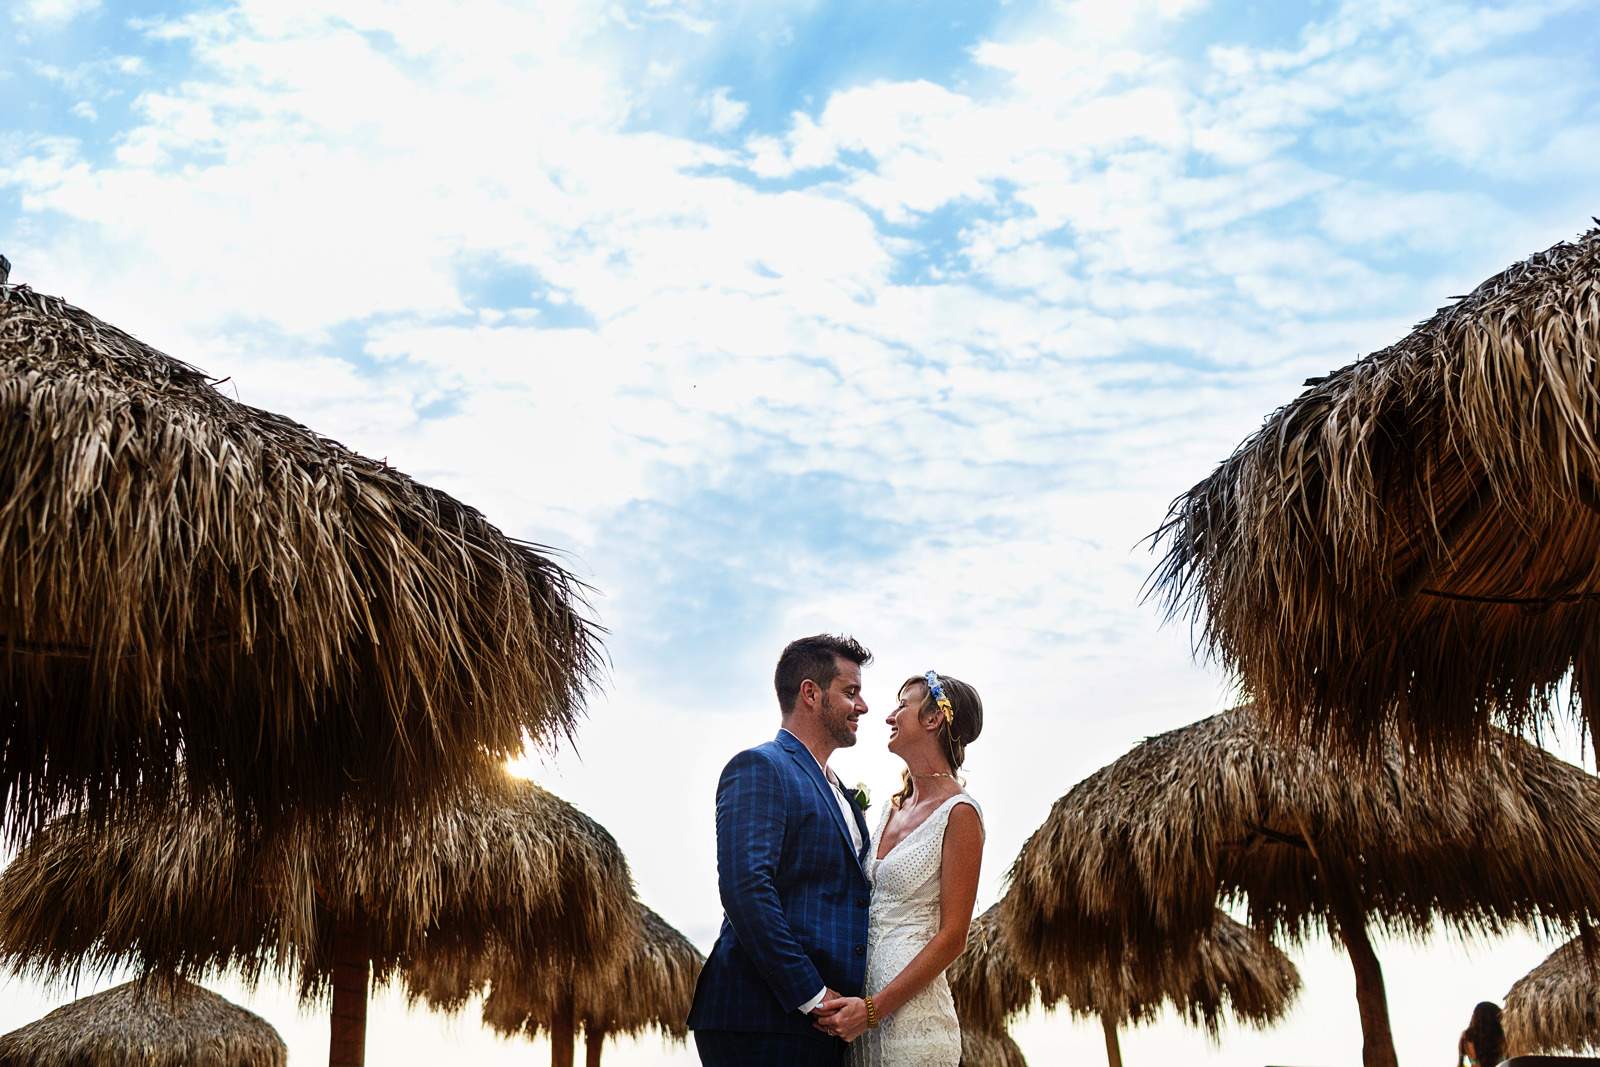 Bride and groom standing between beach palapas at Hyatt Ziva resort in Puerto Vallarta, Mexico